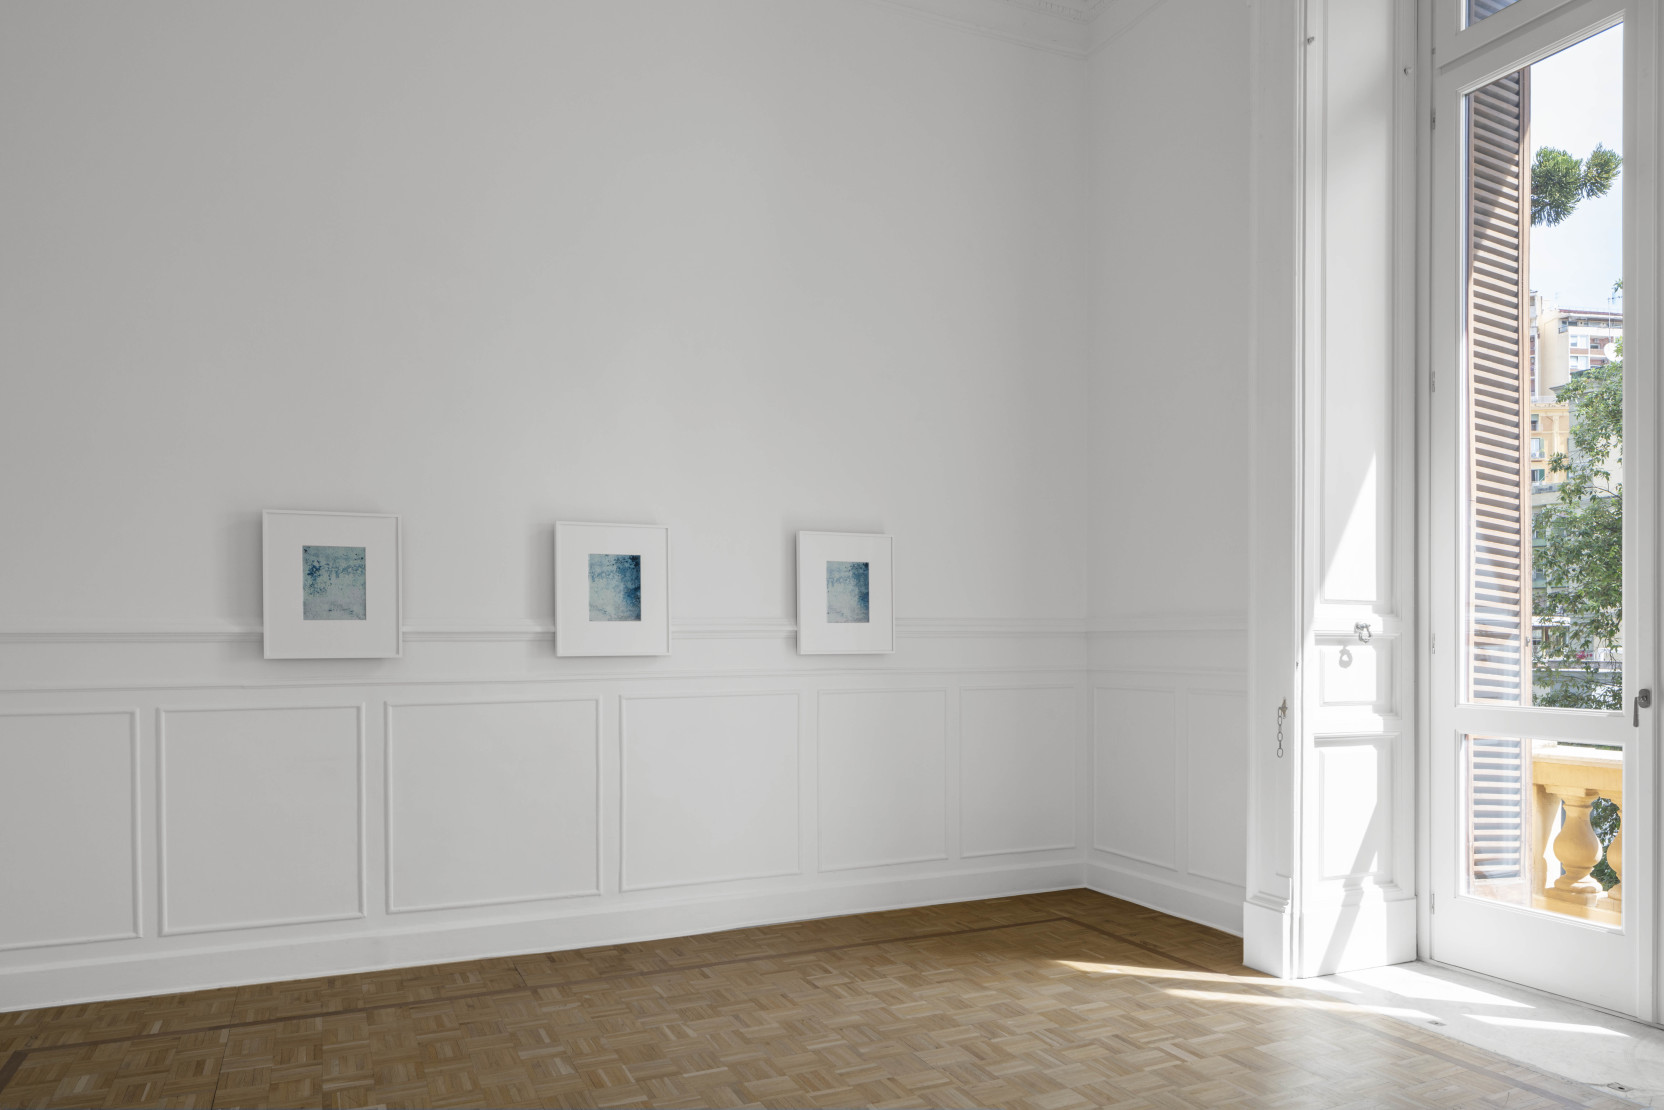 Luisa Lambri: Linee. Lines